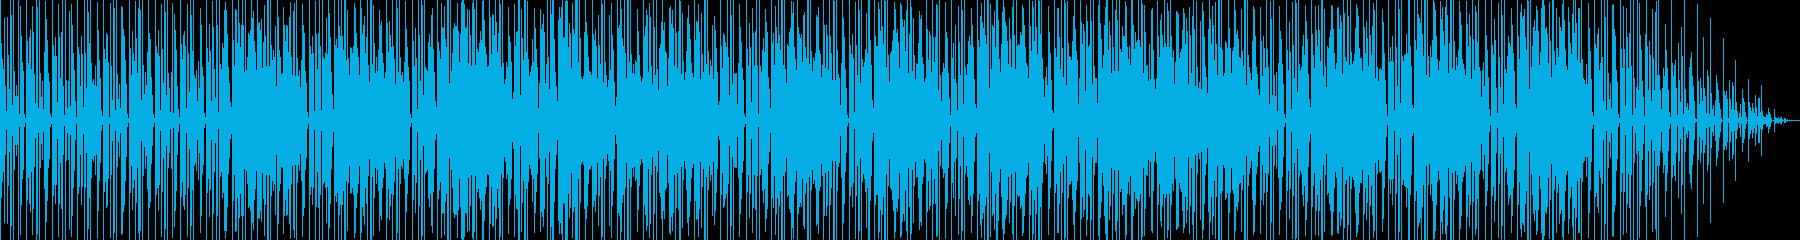 Dance Pop  ダンス ポップの再生済みの波形